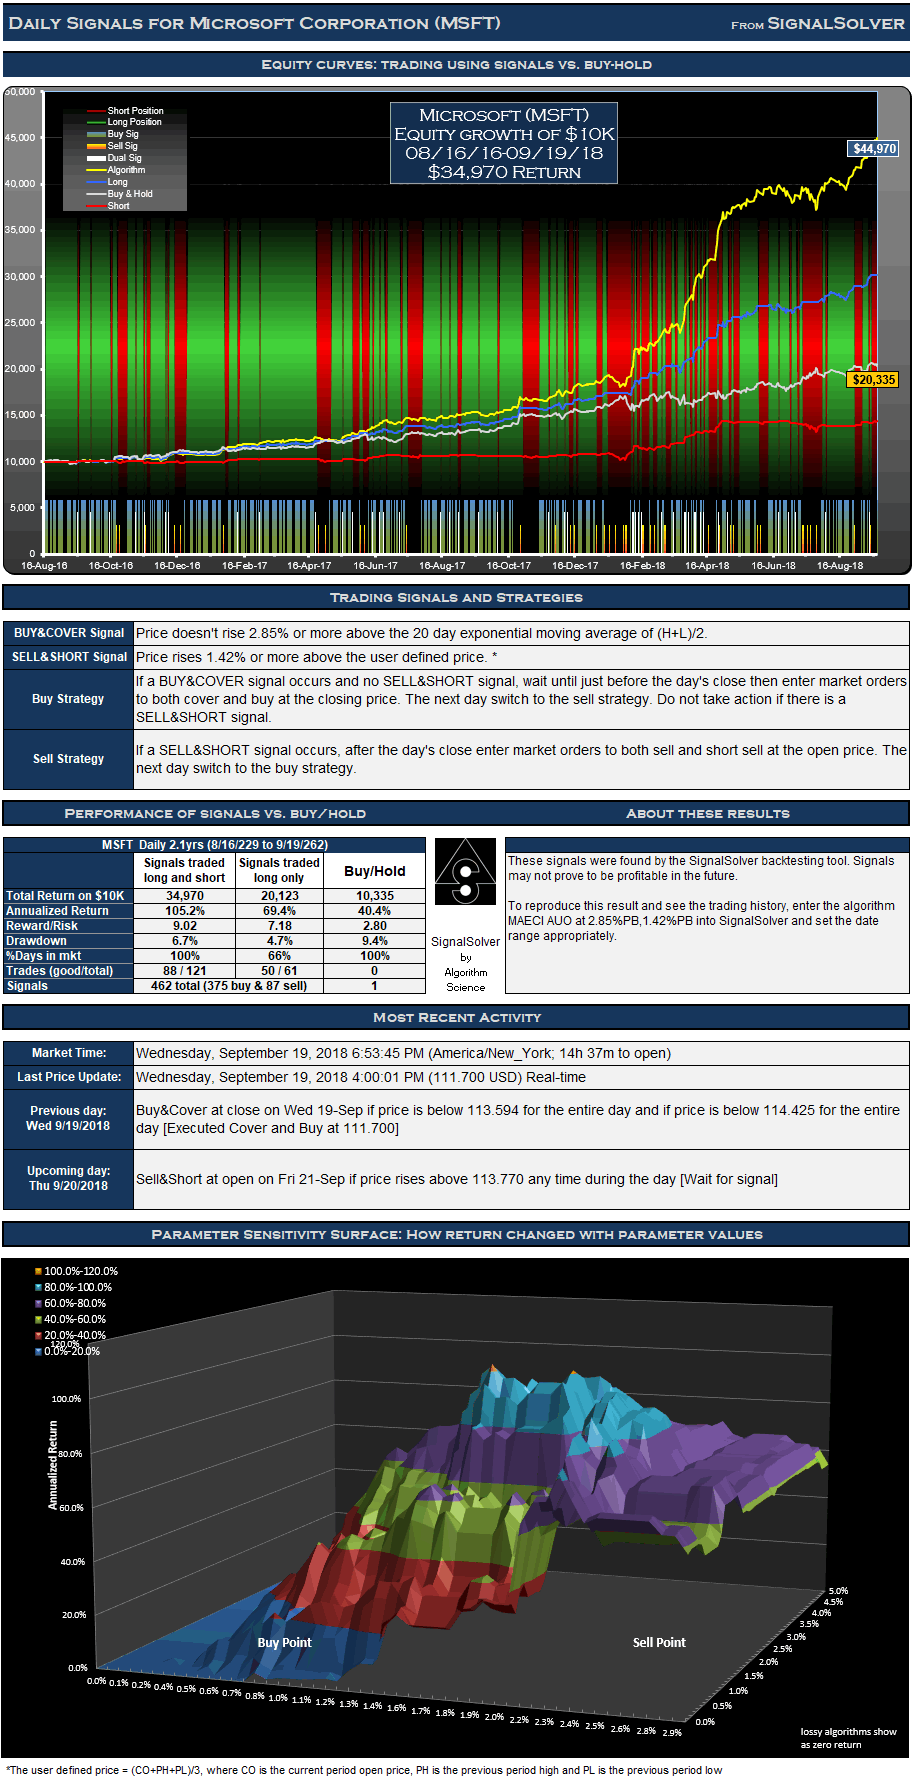 Microsoft (MSFT) Signals